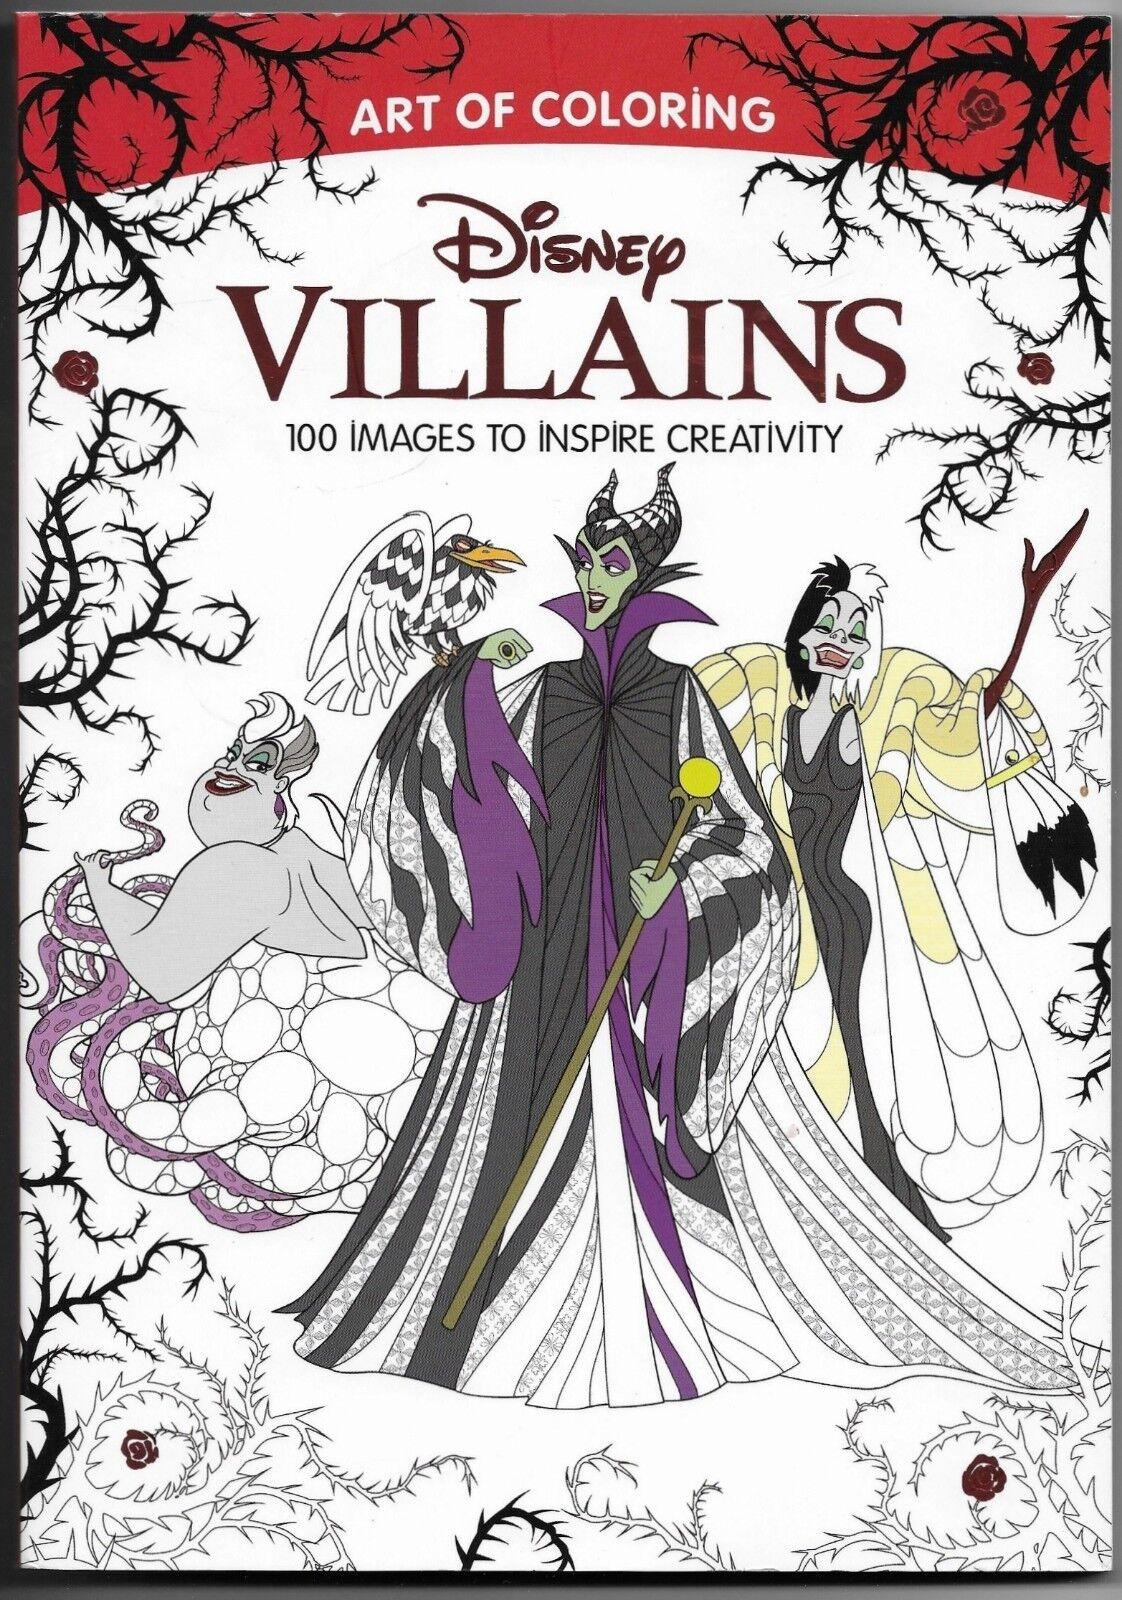 - Art Of Coloring Ser.: Art Of Coloring: Disney Villains (Walmart